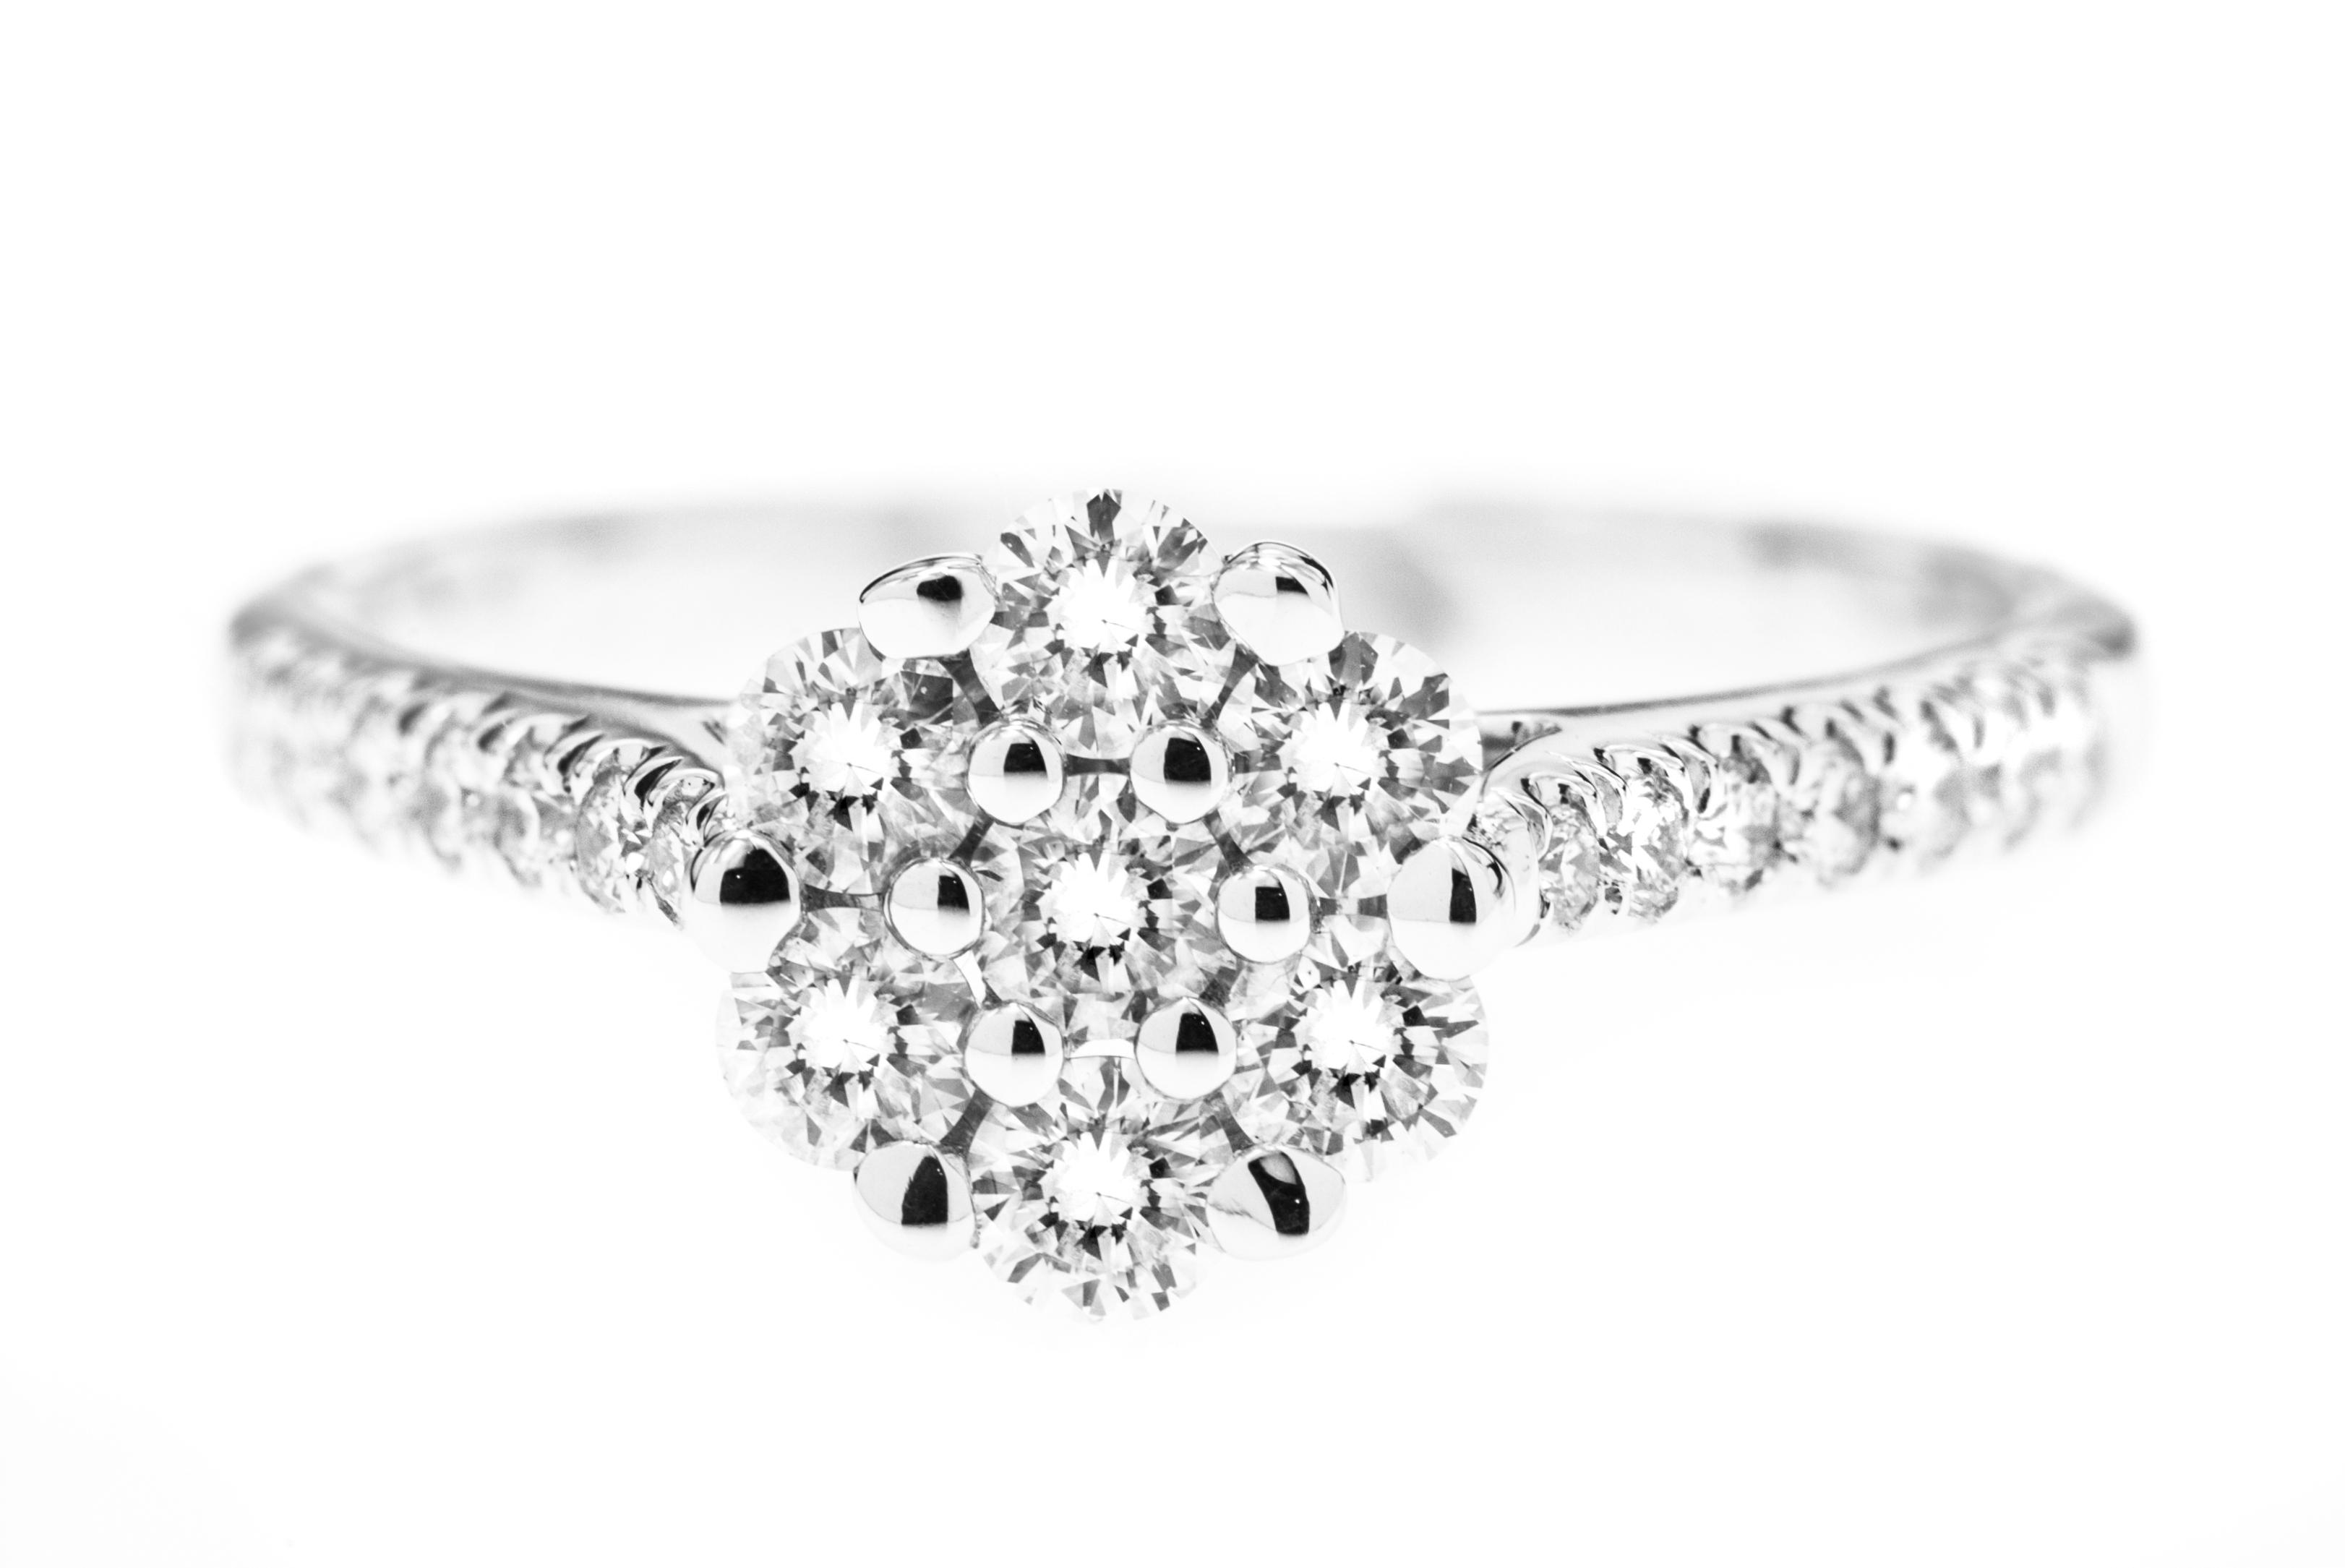 Inel de Logodna Cluster Dama Aur Alb 18kt cu Mai Multe Diamante Rotund Briliant in Setare Gheare-img1